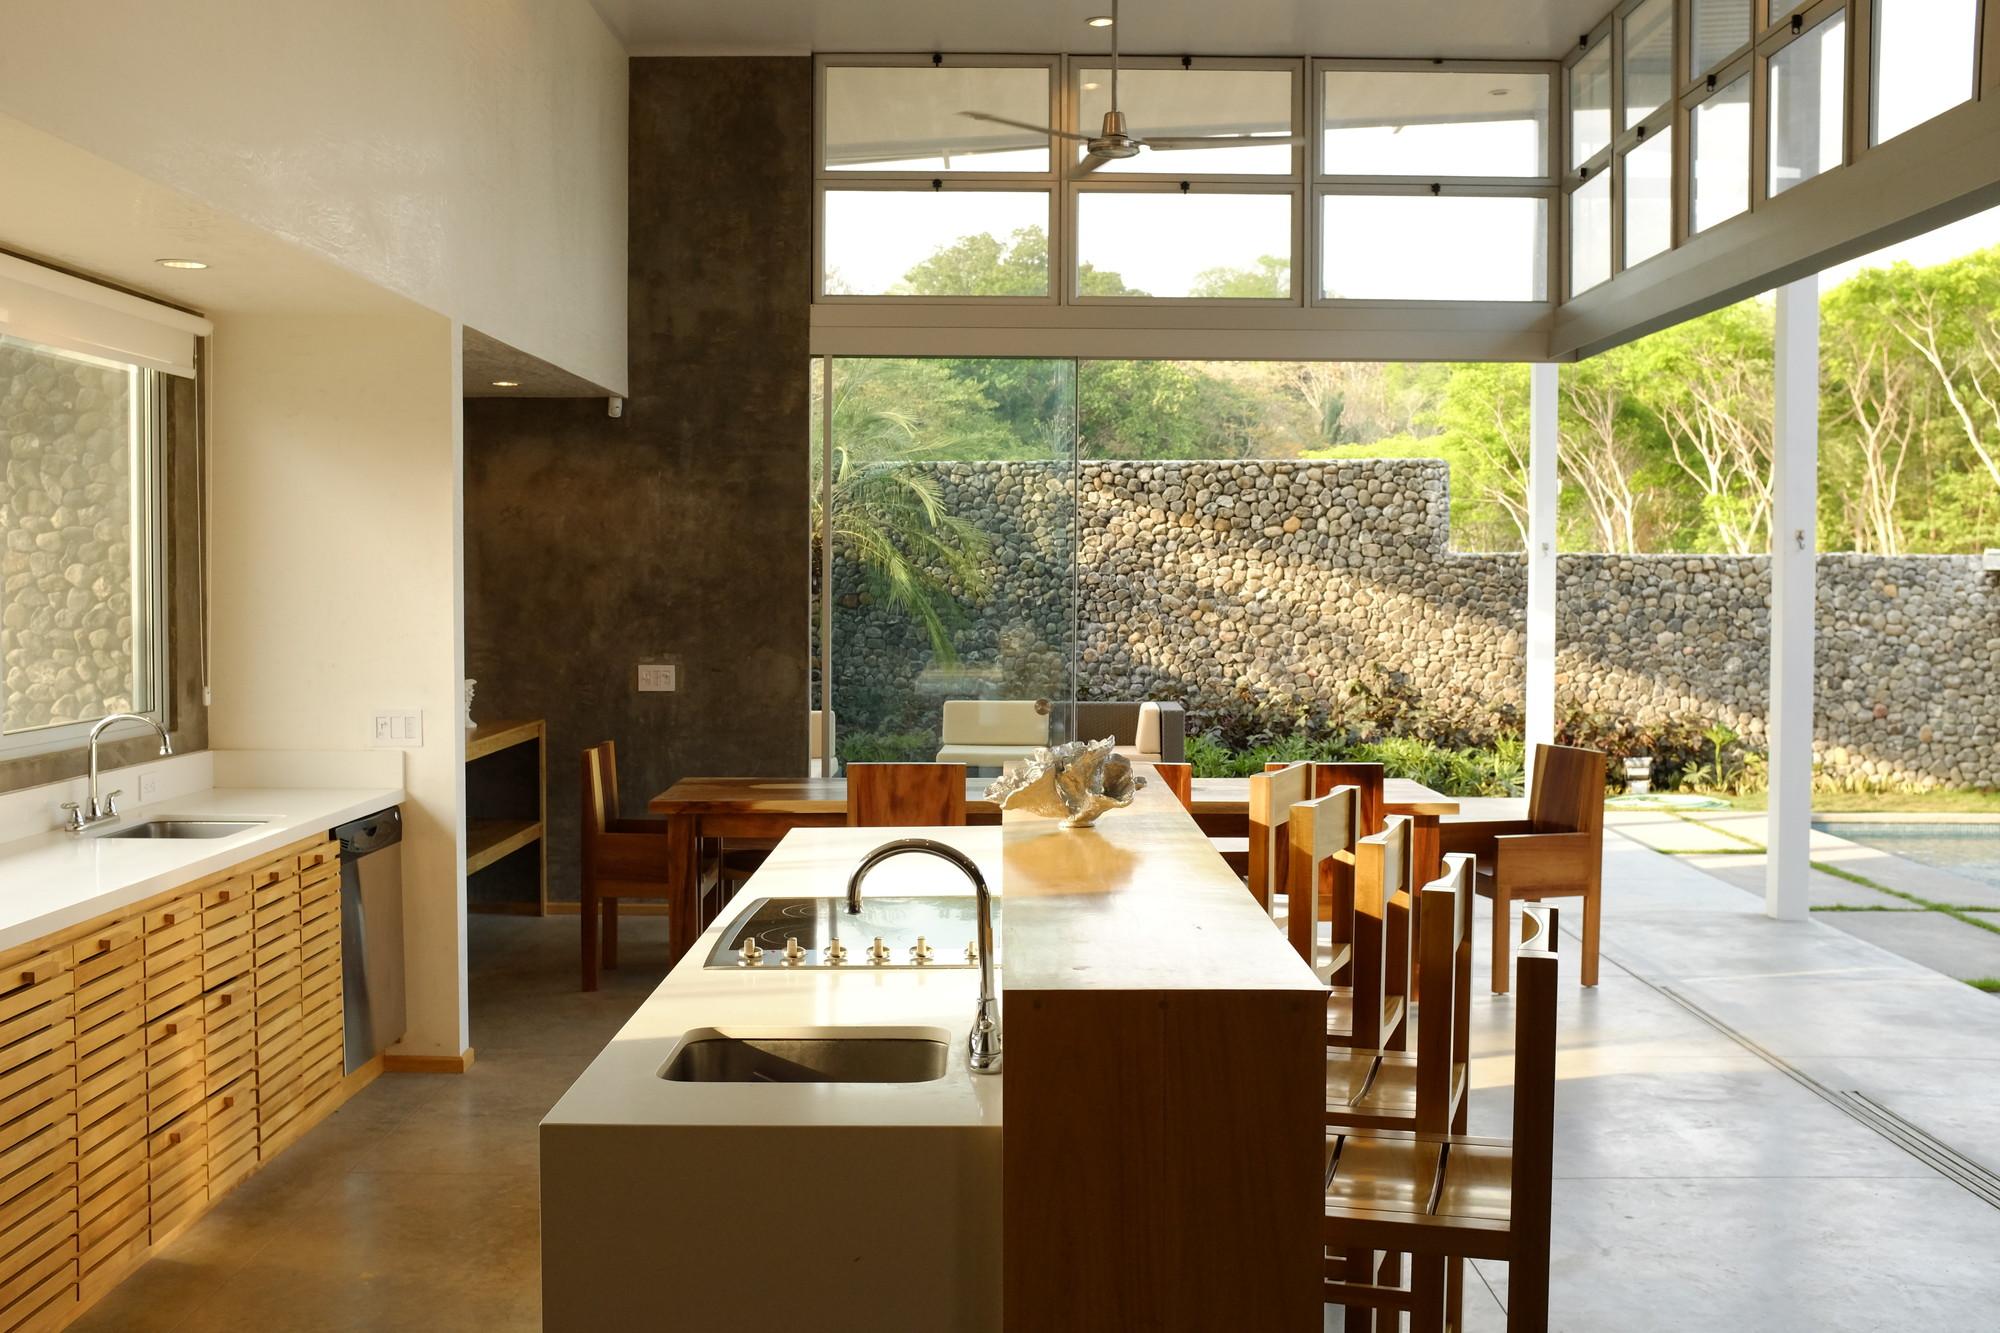 Galer a de casa jard n del mar salagnac arquitectos 6 for Casas jardin del mar